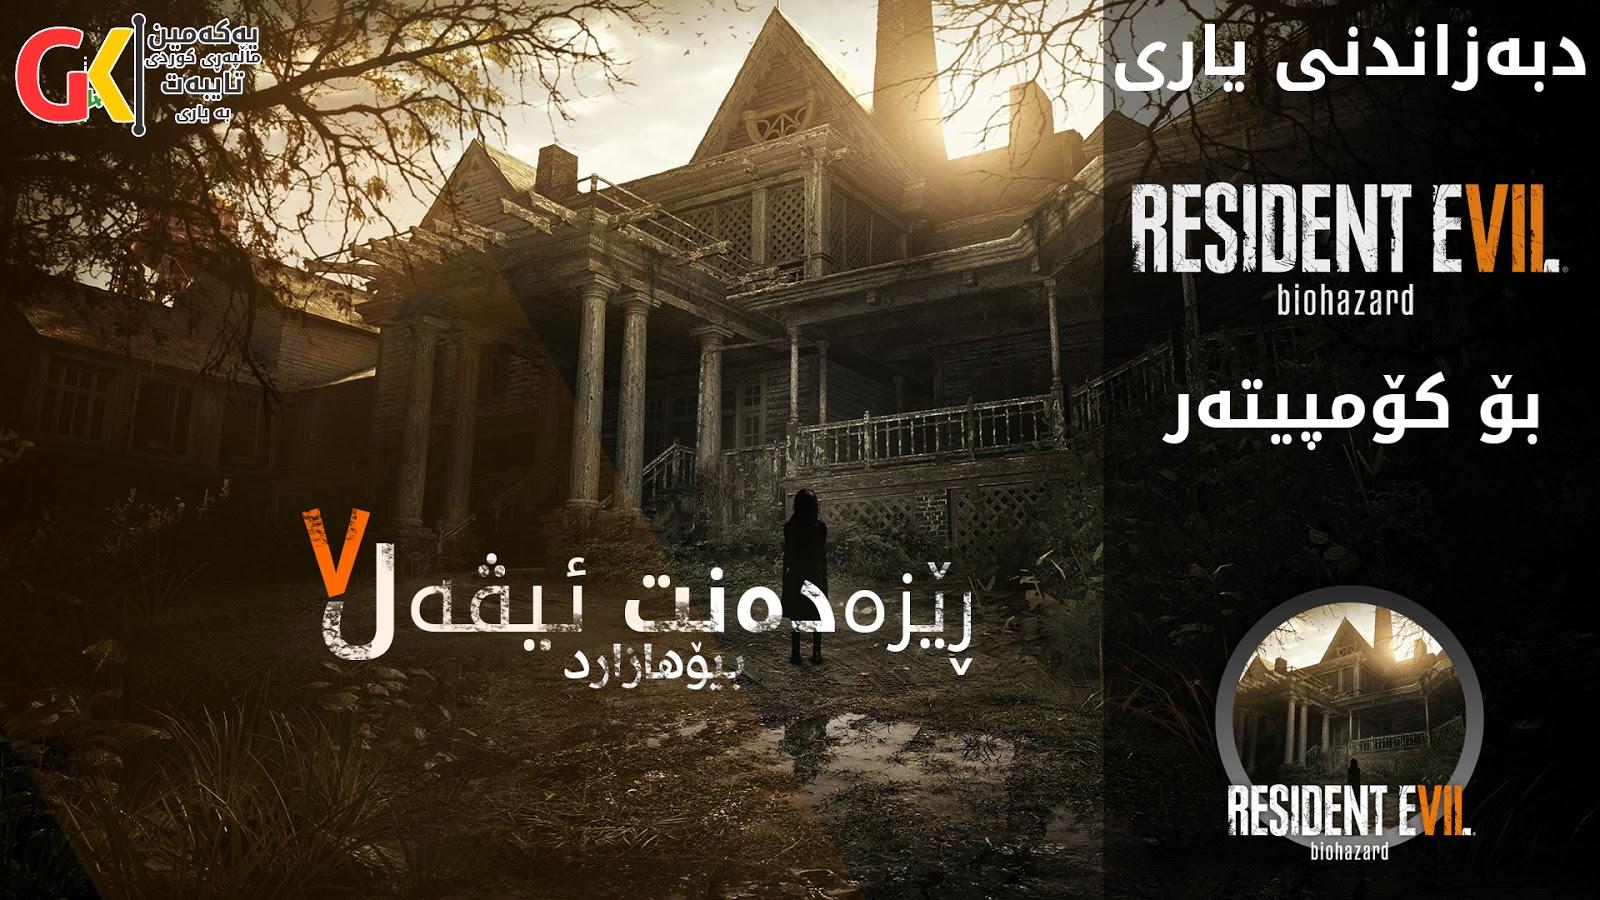 داگرتنی یاری Resident Evil 7 بۆ كۆمپیوتهر